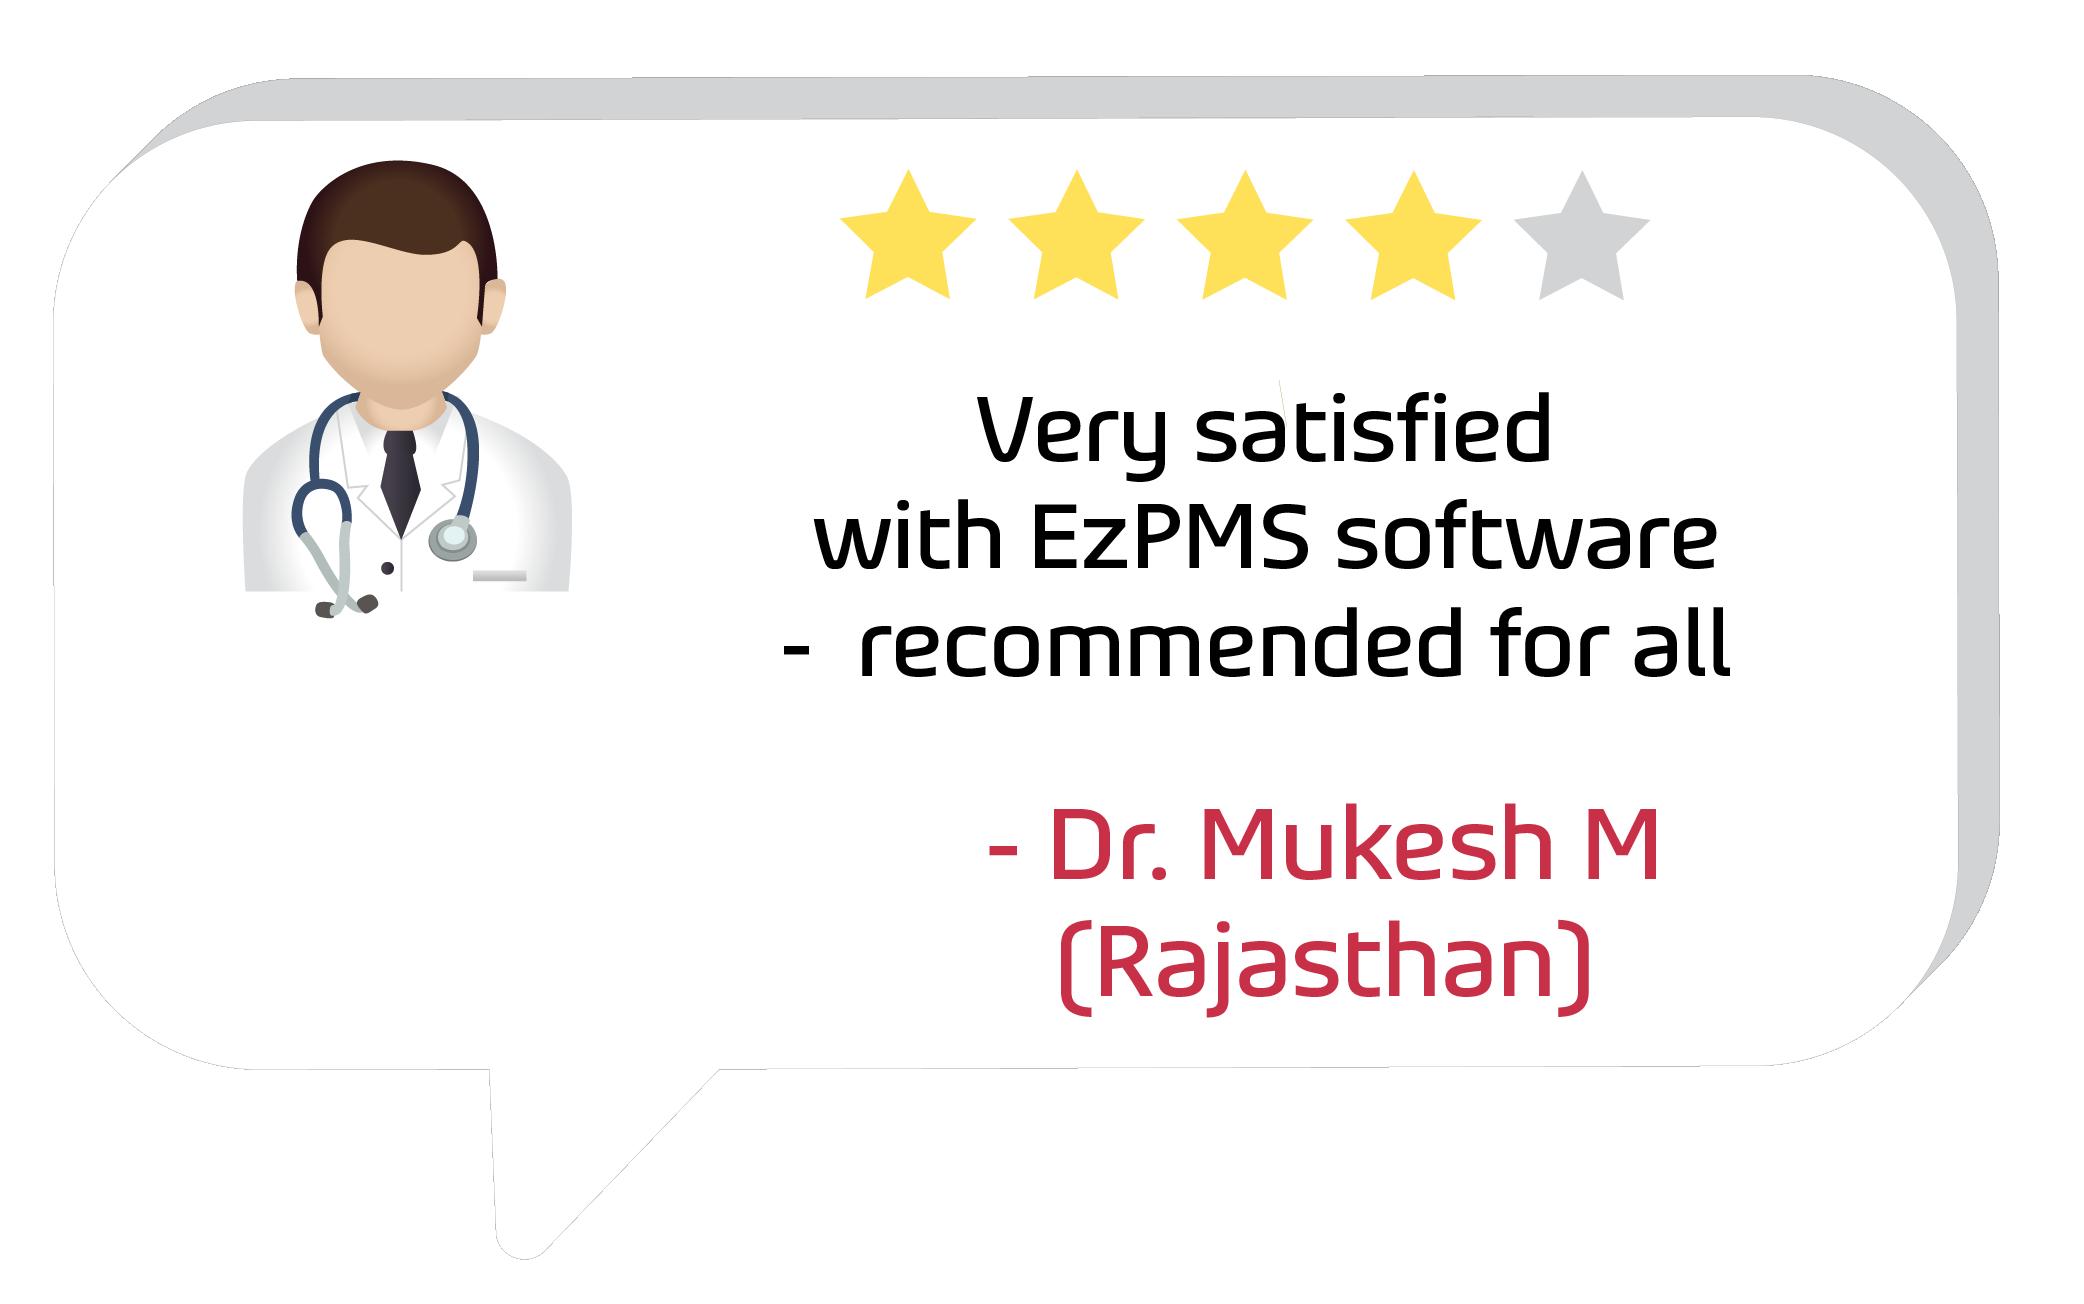 Dr. Mukesh M